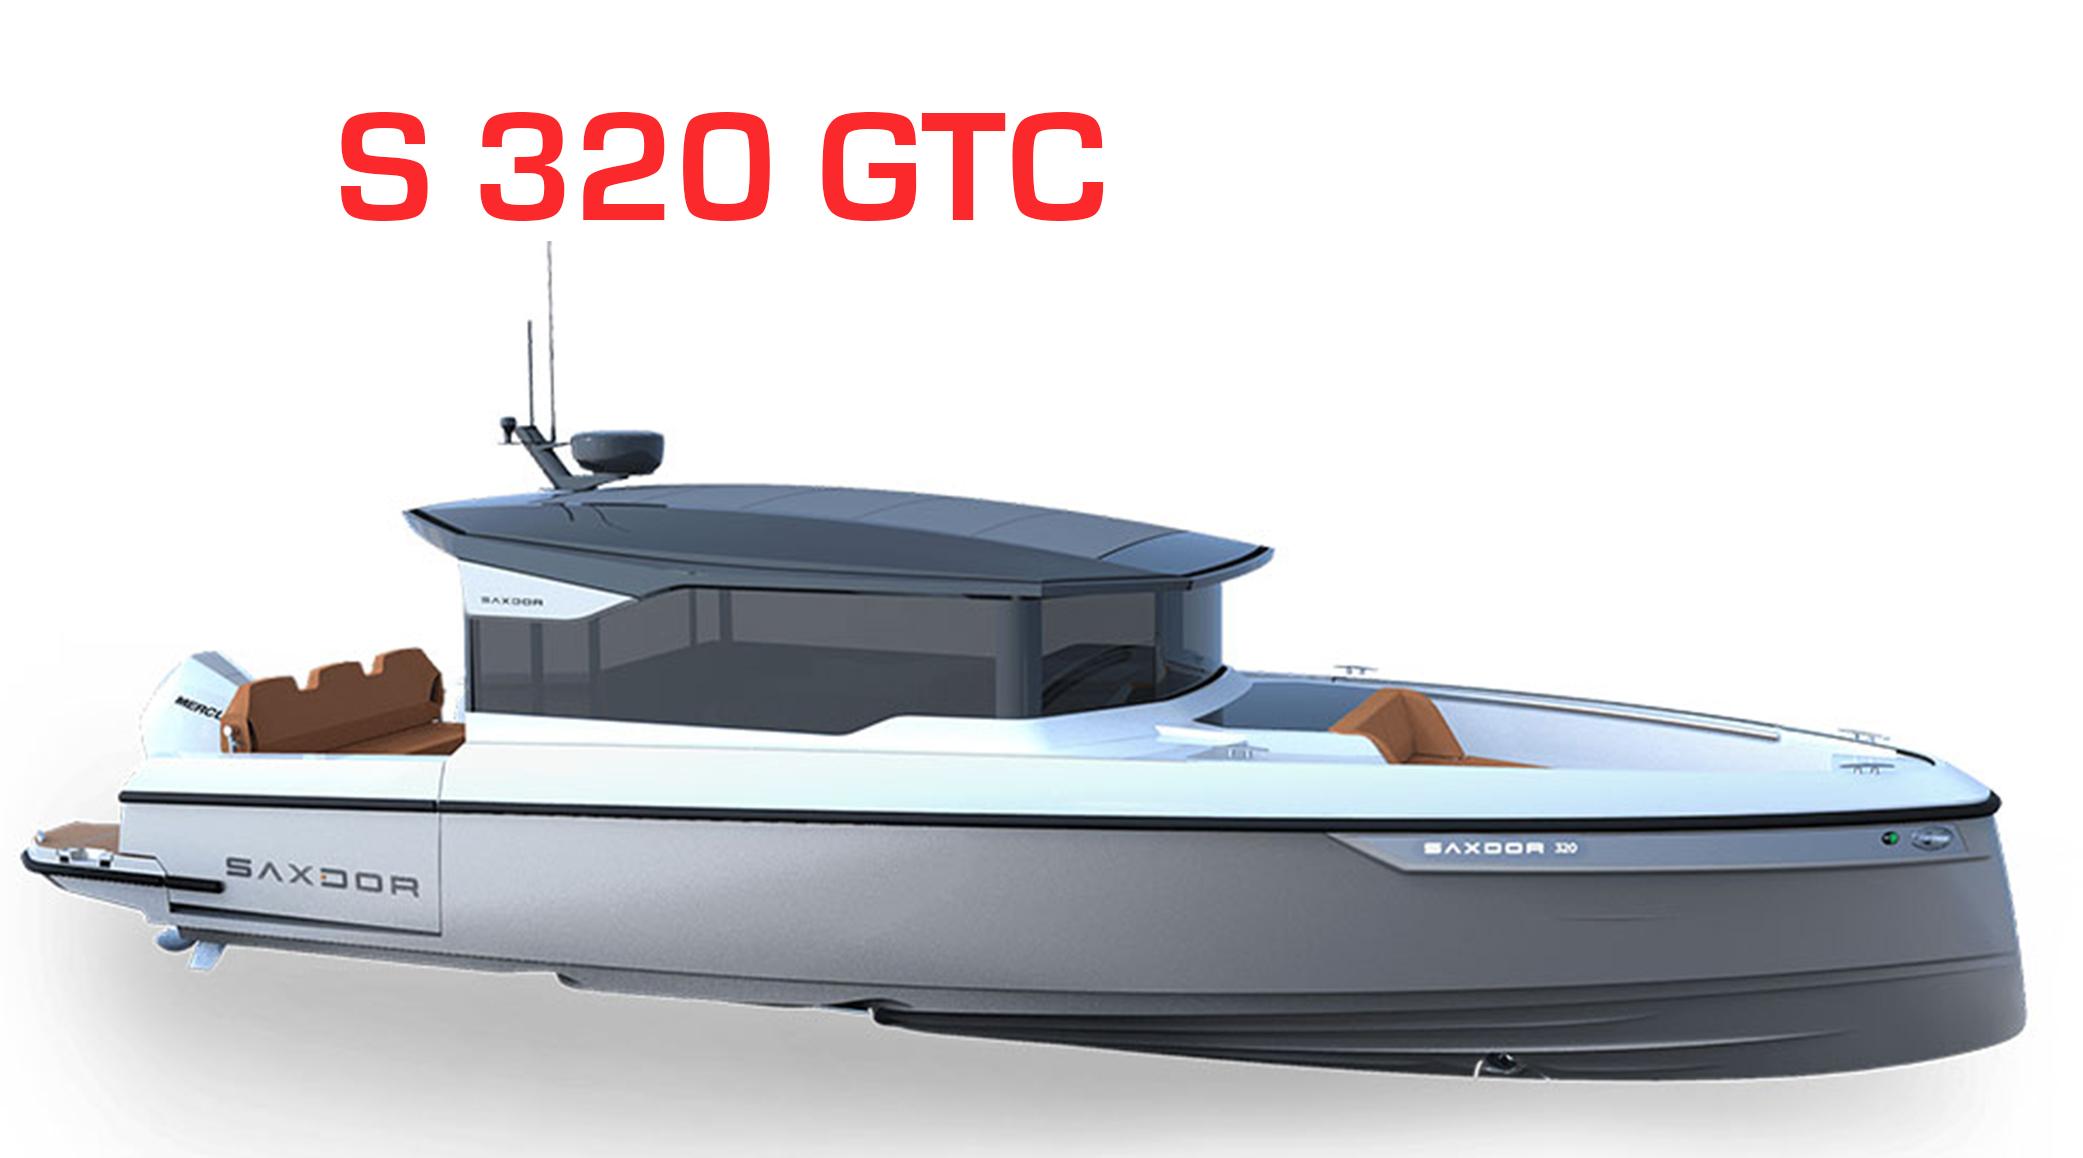 S 320 GTC